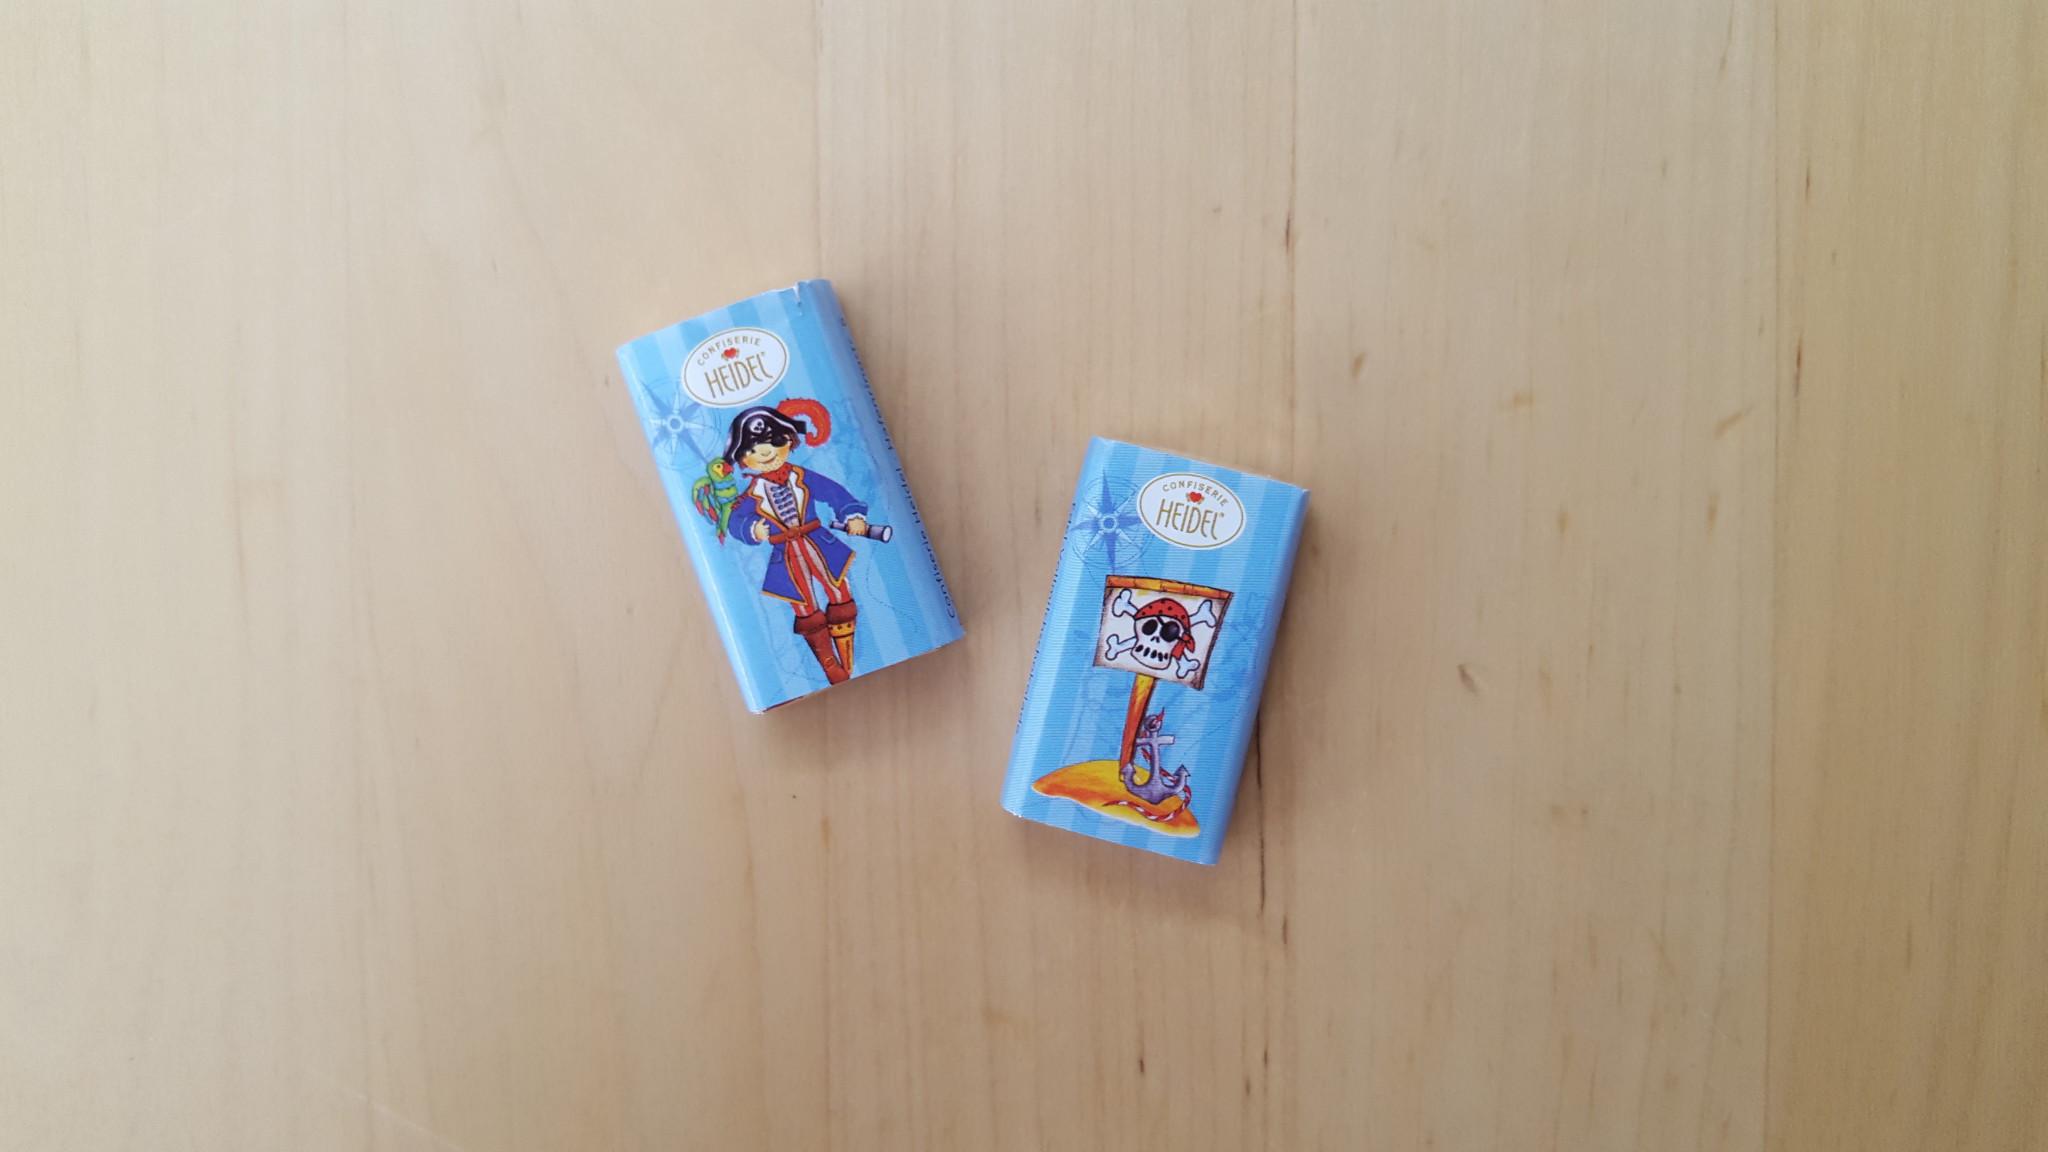 Piraten-Schokolade